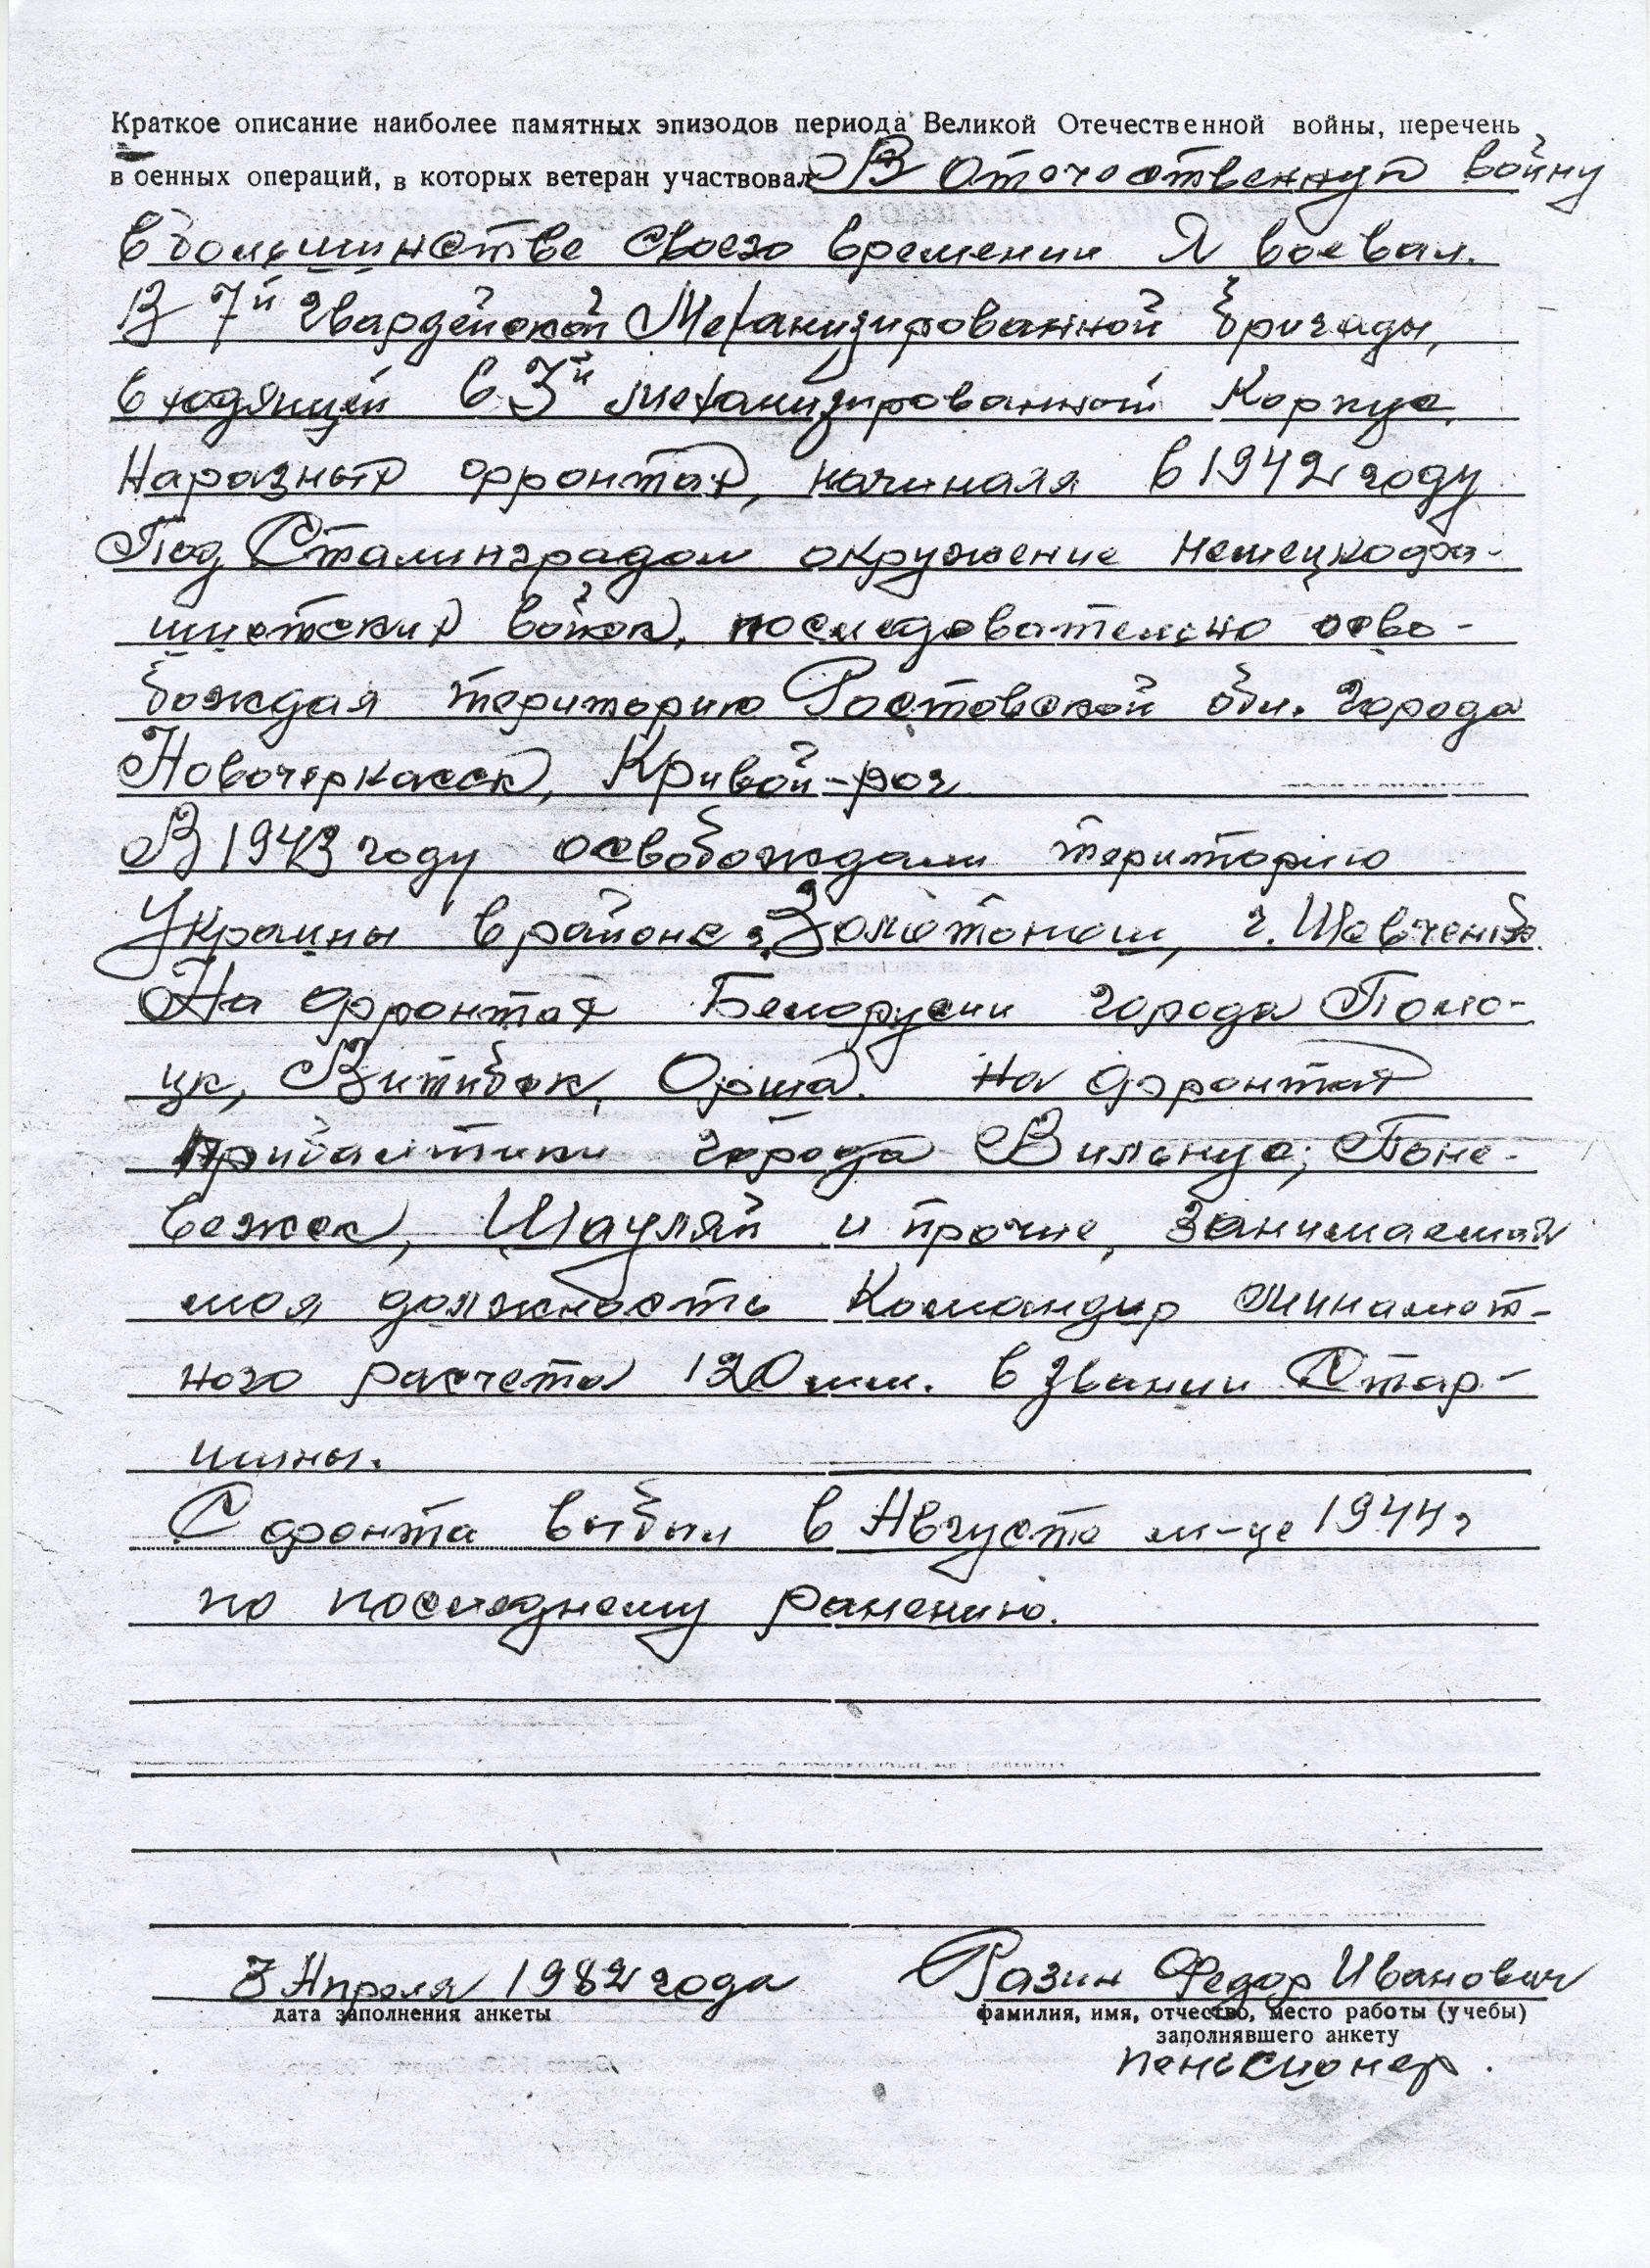 Анкета ветерана войны. Из архива Крутова С.